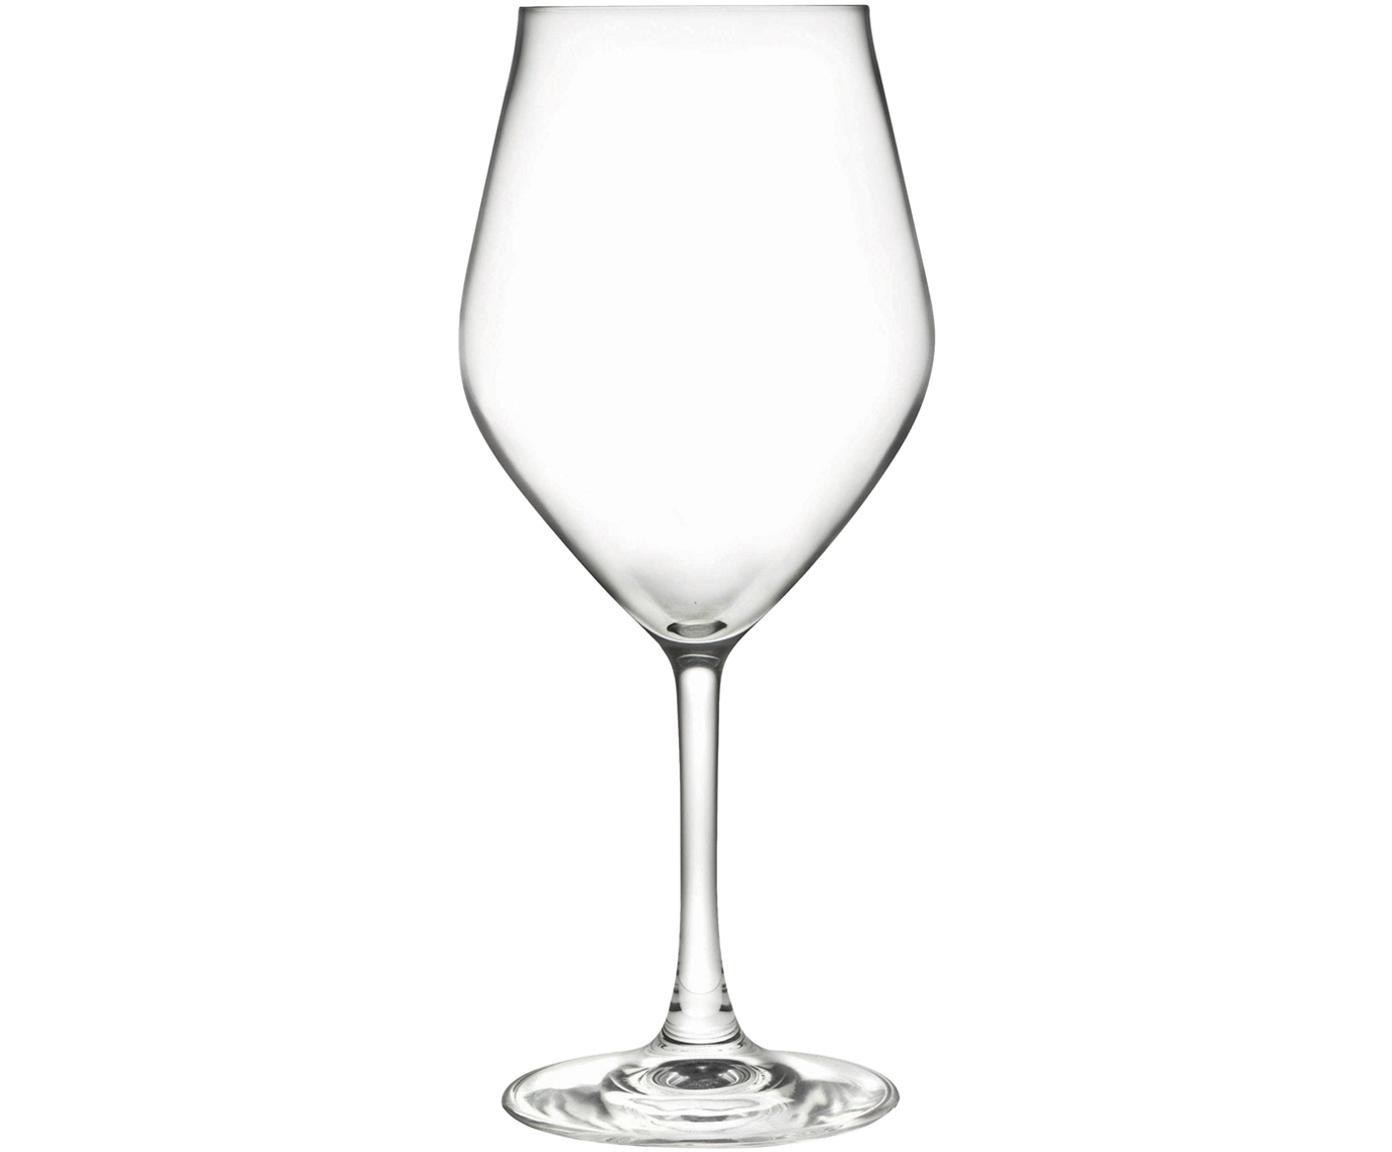 Kristall-Weißweingläser Eno, 6er-Set, Luxion-Kristallglas, Transparent, Ø 10 x H 22 cm